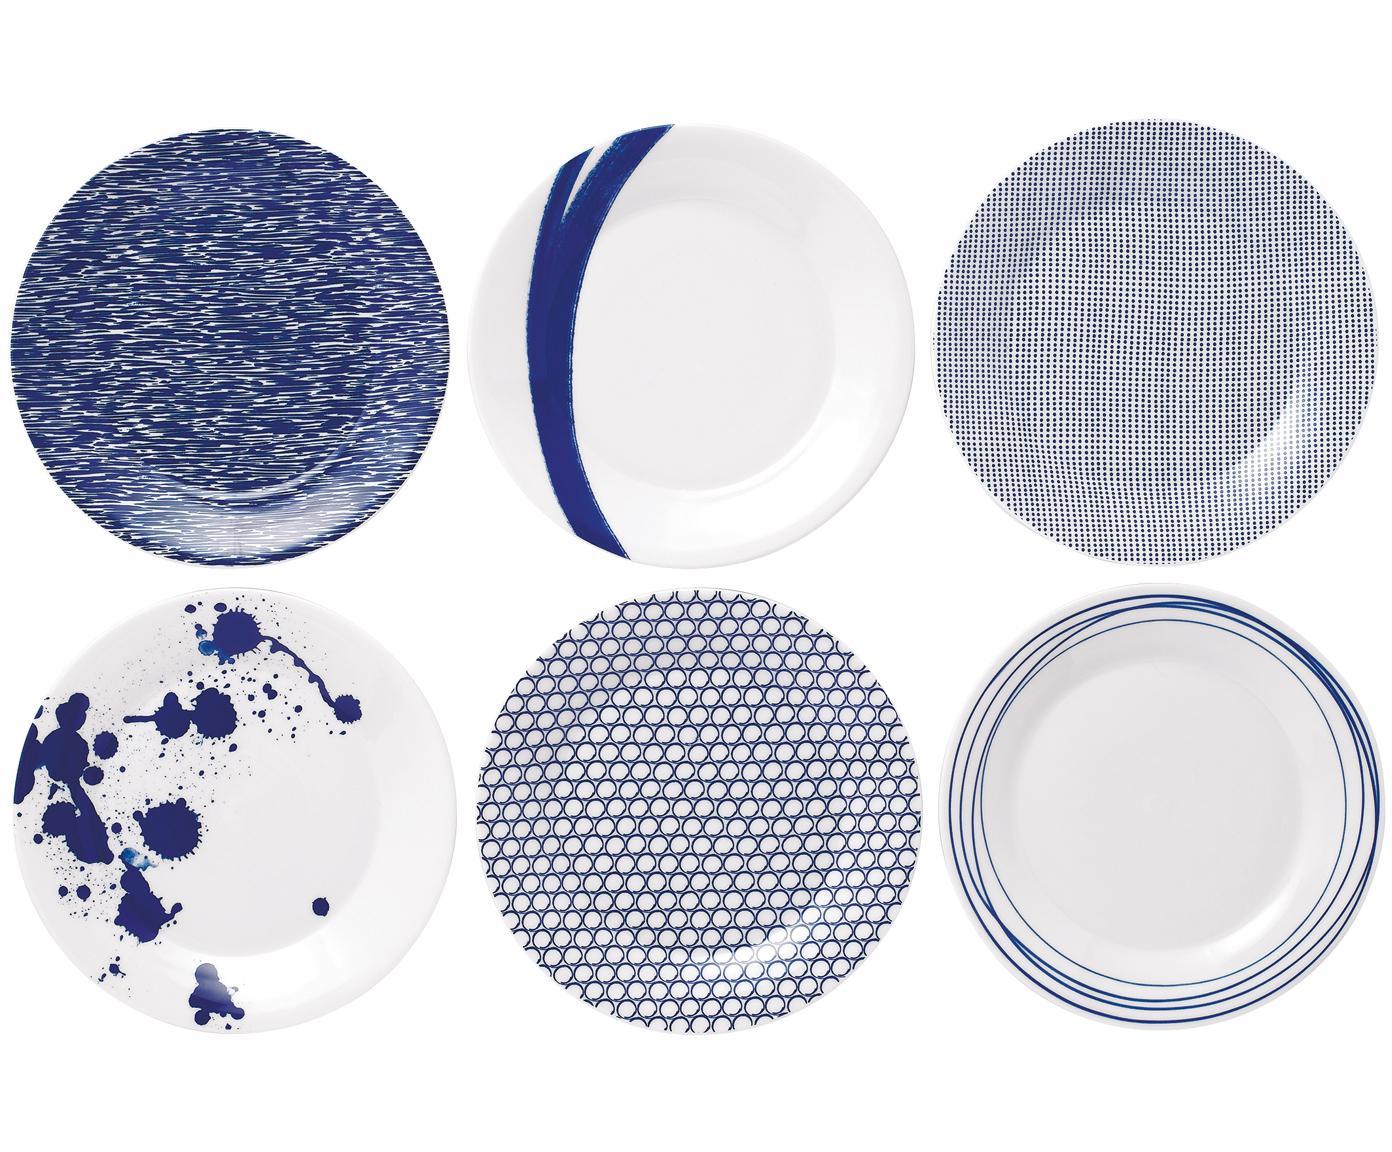 Platos postre Pacific, 6pzas., Porcelana, Blanco, azul, Ø 23 cm